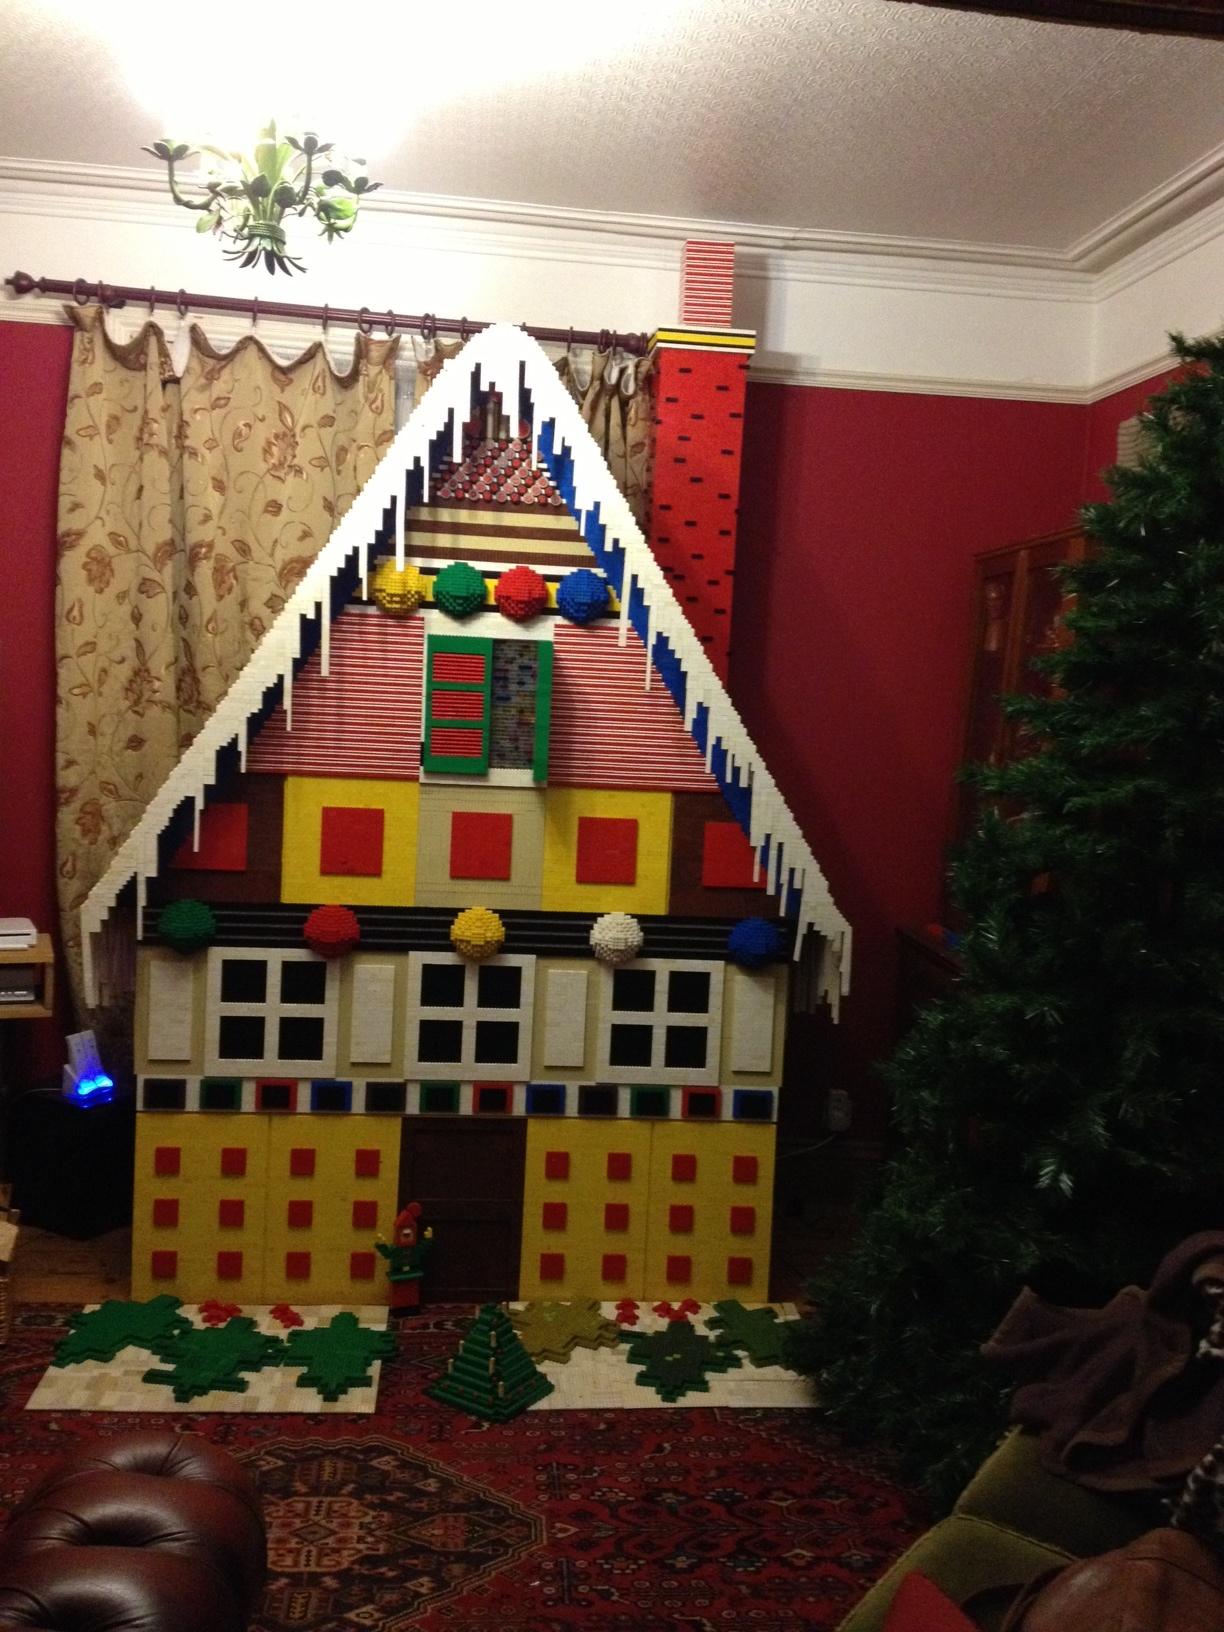 Huntingdon: Family Make A Giant Lego House For Their ...